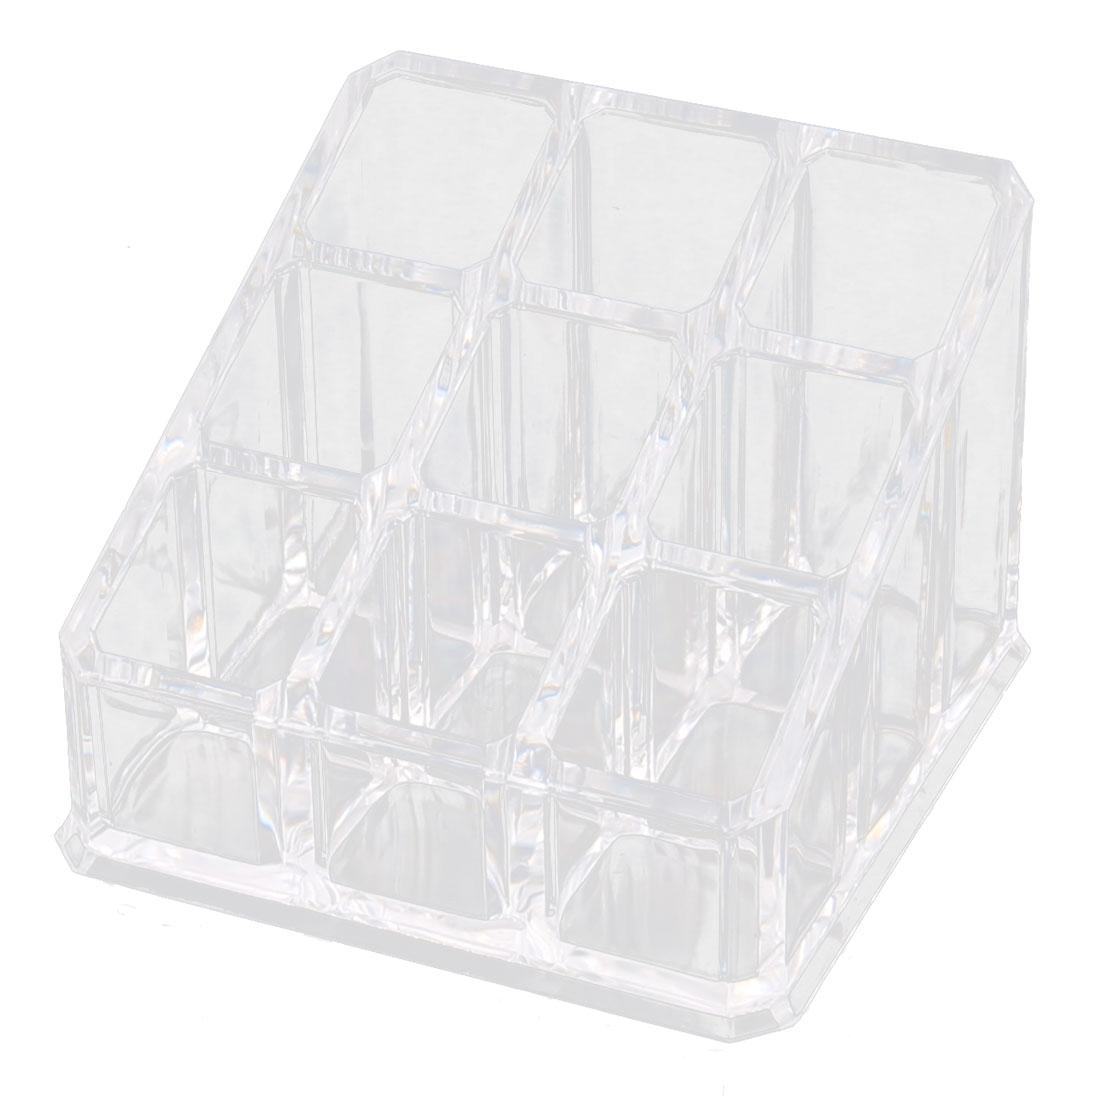 Acrylic 9 Slots Lipstick Cosmetic Brush Holder Jewelry Box Organizer Clear